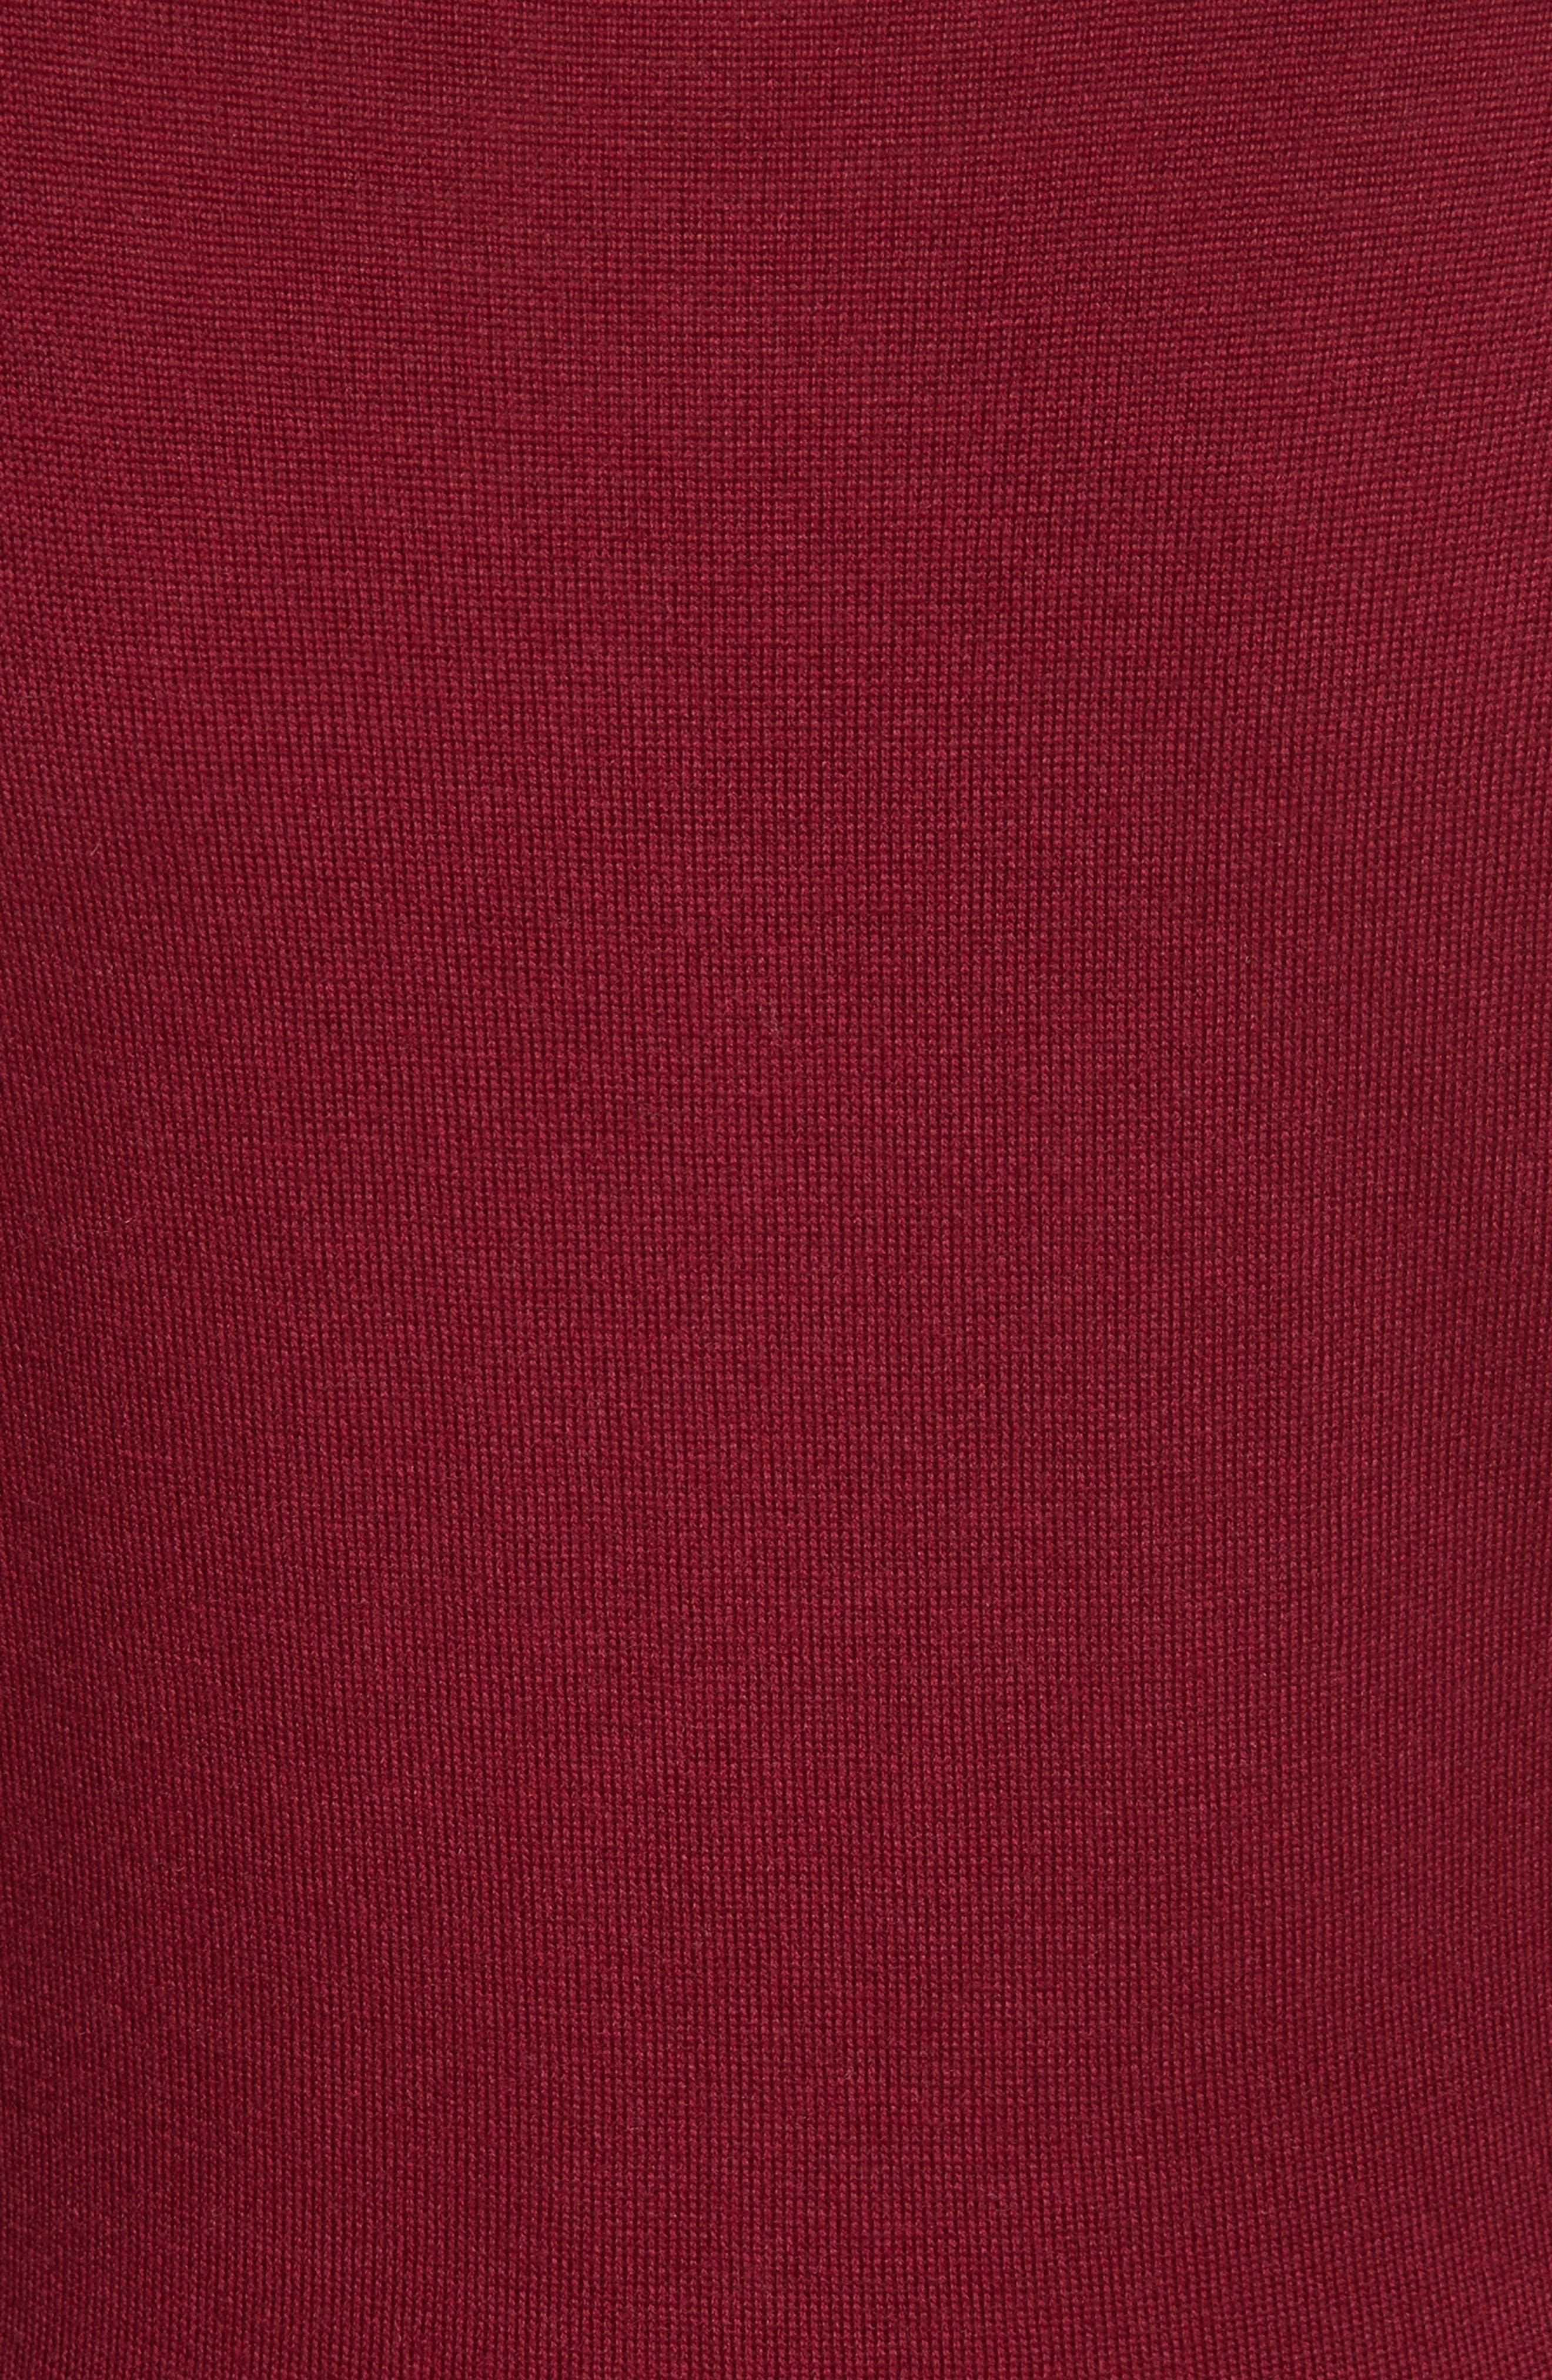 Alternate Image 5  - Valentino Guipure Lace & Wool Knit Dress